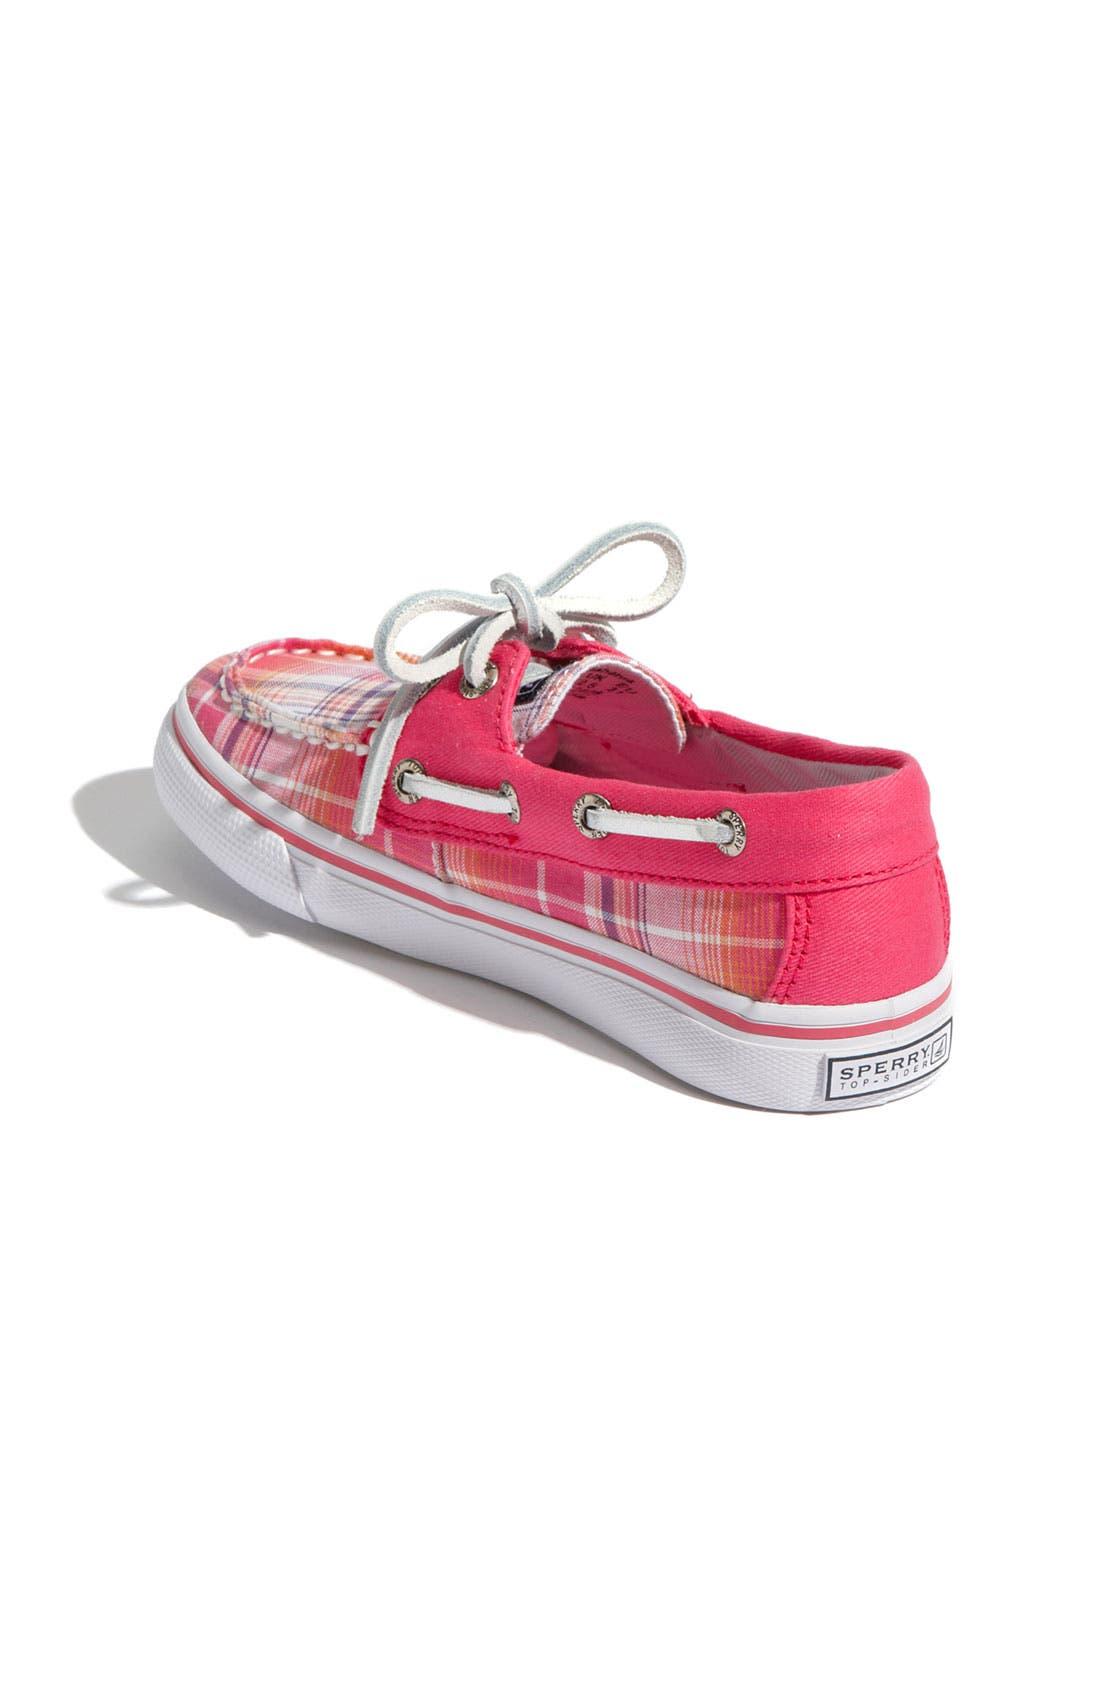 Alternate Image 2  - Sperry Top-Sider® 'Bahama' Boat Shoe (Little Kid & Big Kid)